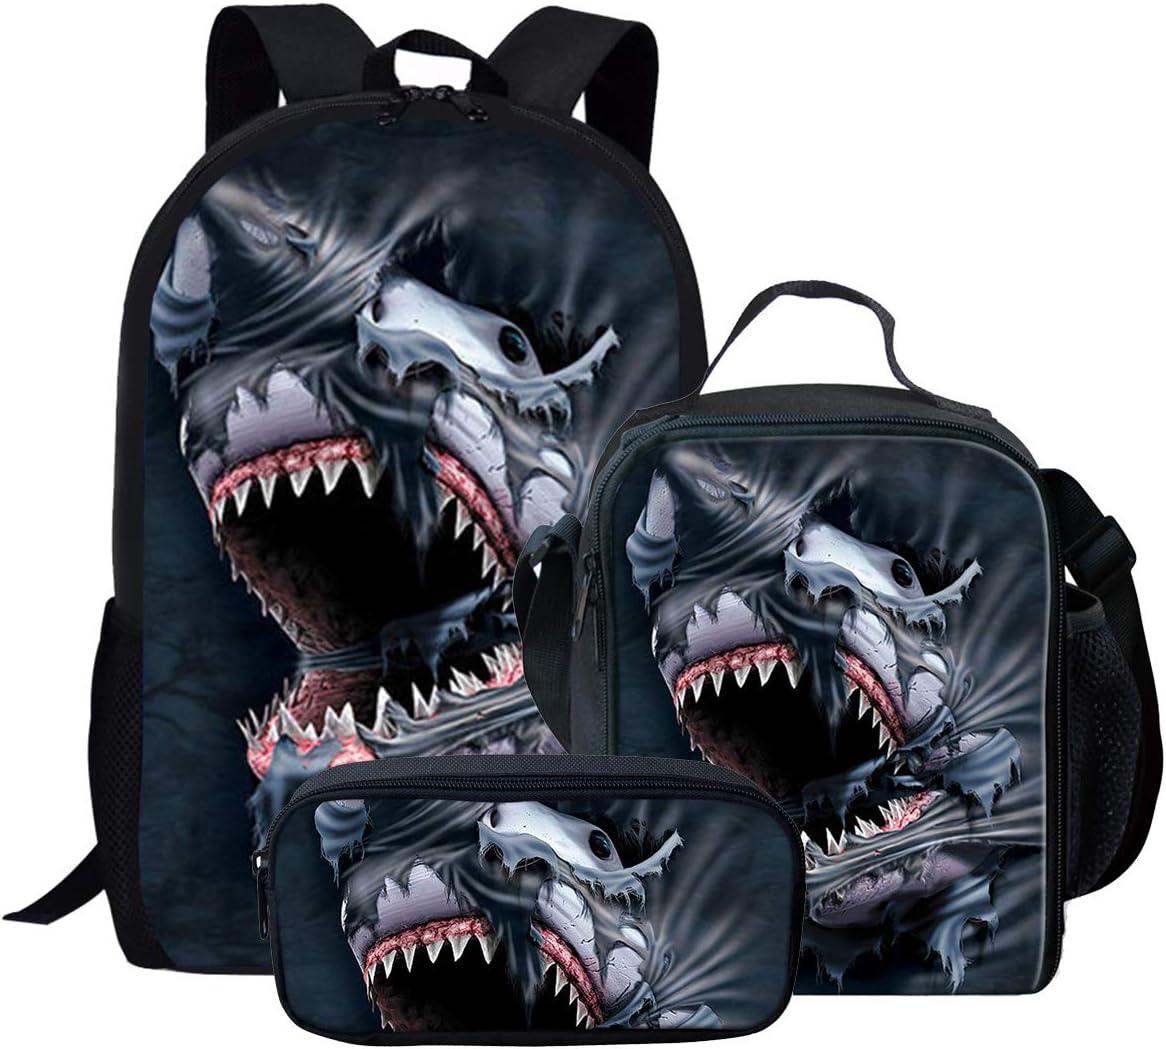 Cool Shark 3D Print Backpack for Kids Pre-School Bookbag Lunch Bag Pencil Bag 3 Piece Set